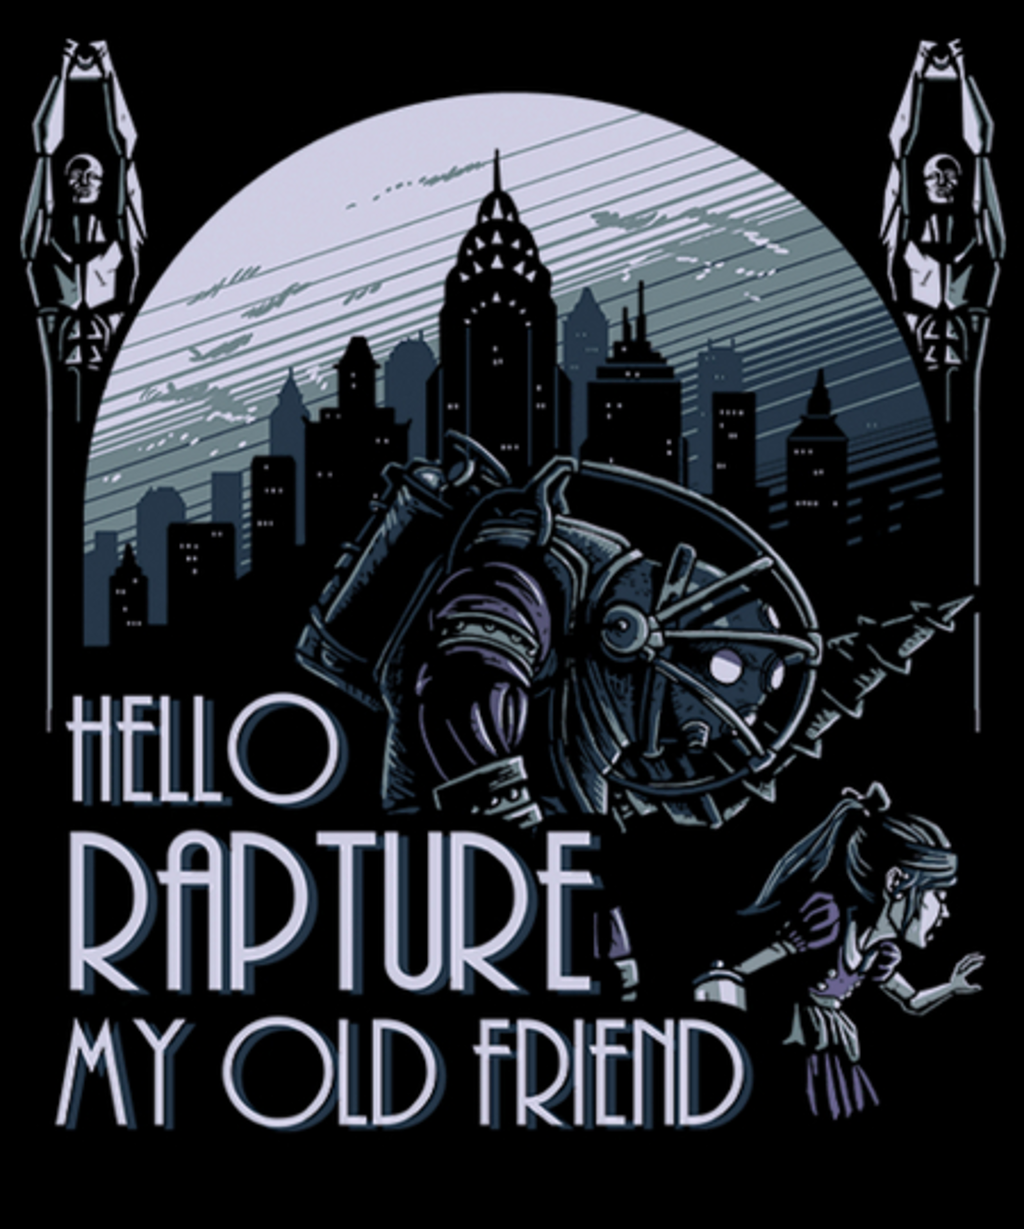 Qwertee: Hello Rapture